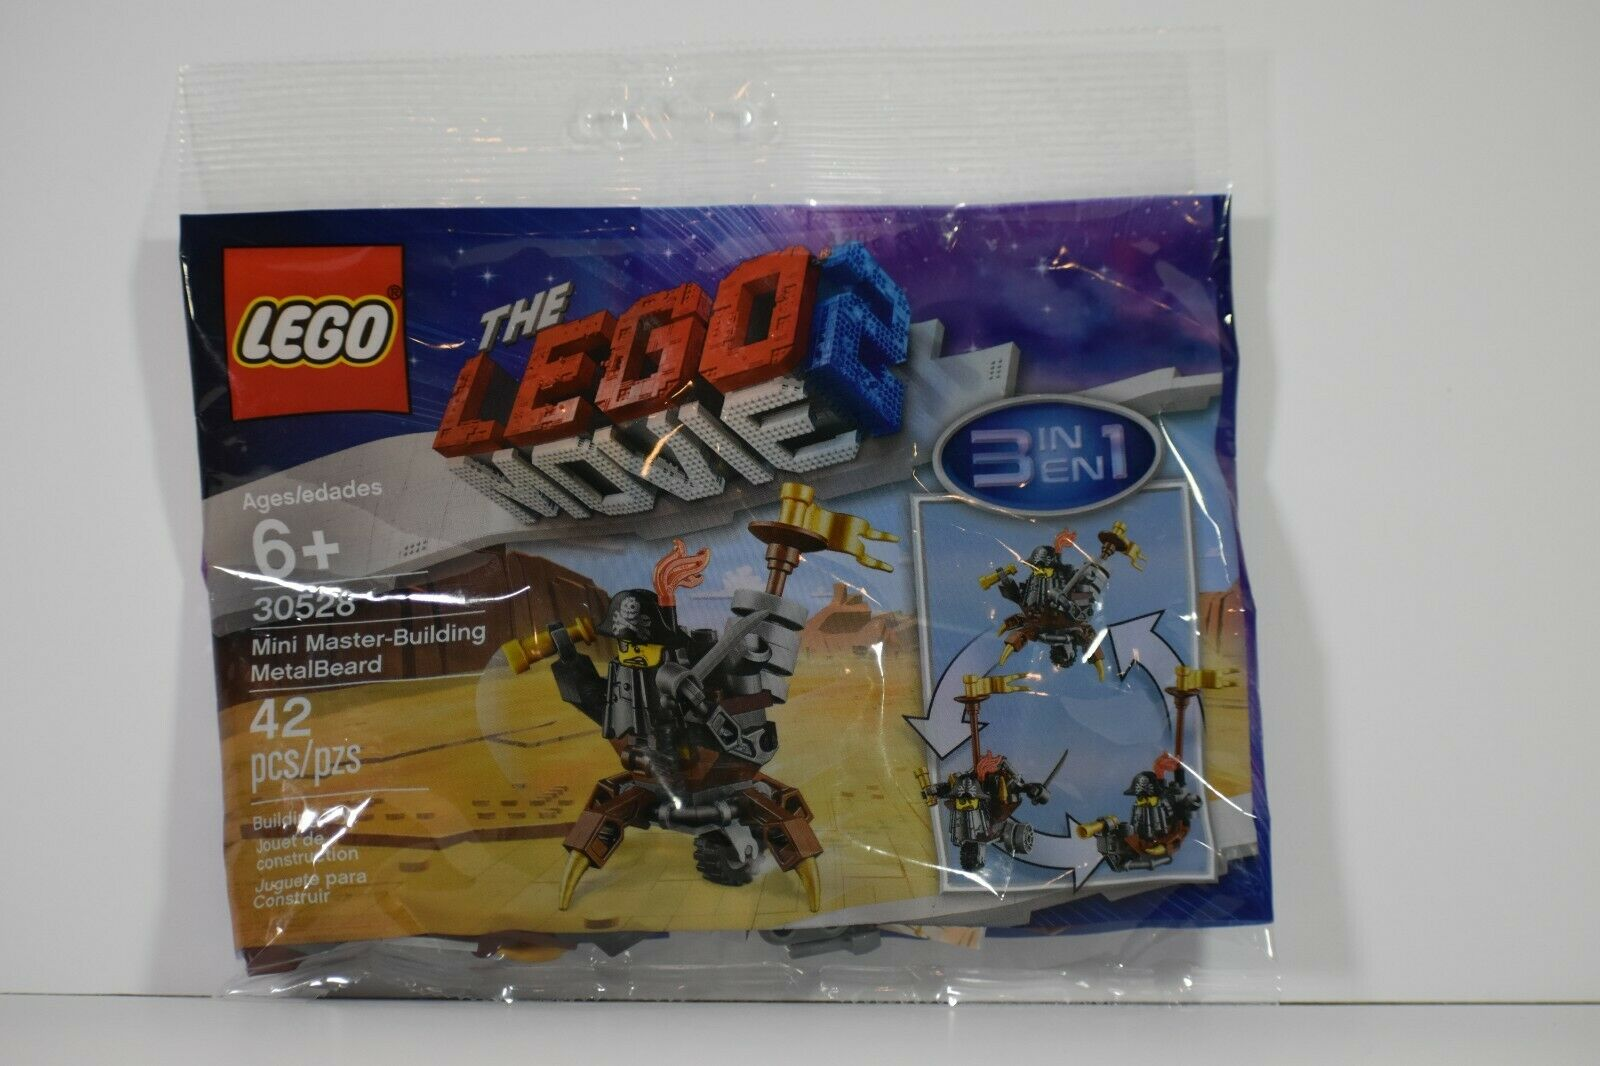 42 pieces LEGO 30528 Mini Master-Building MetalBeard Polybag